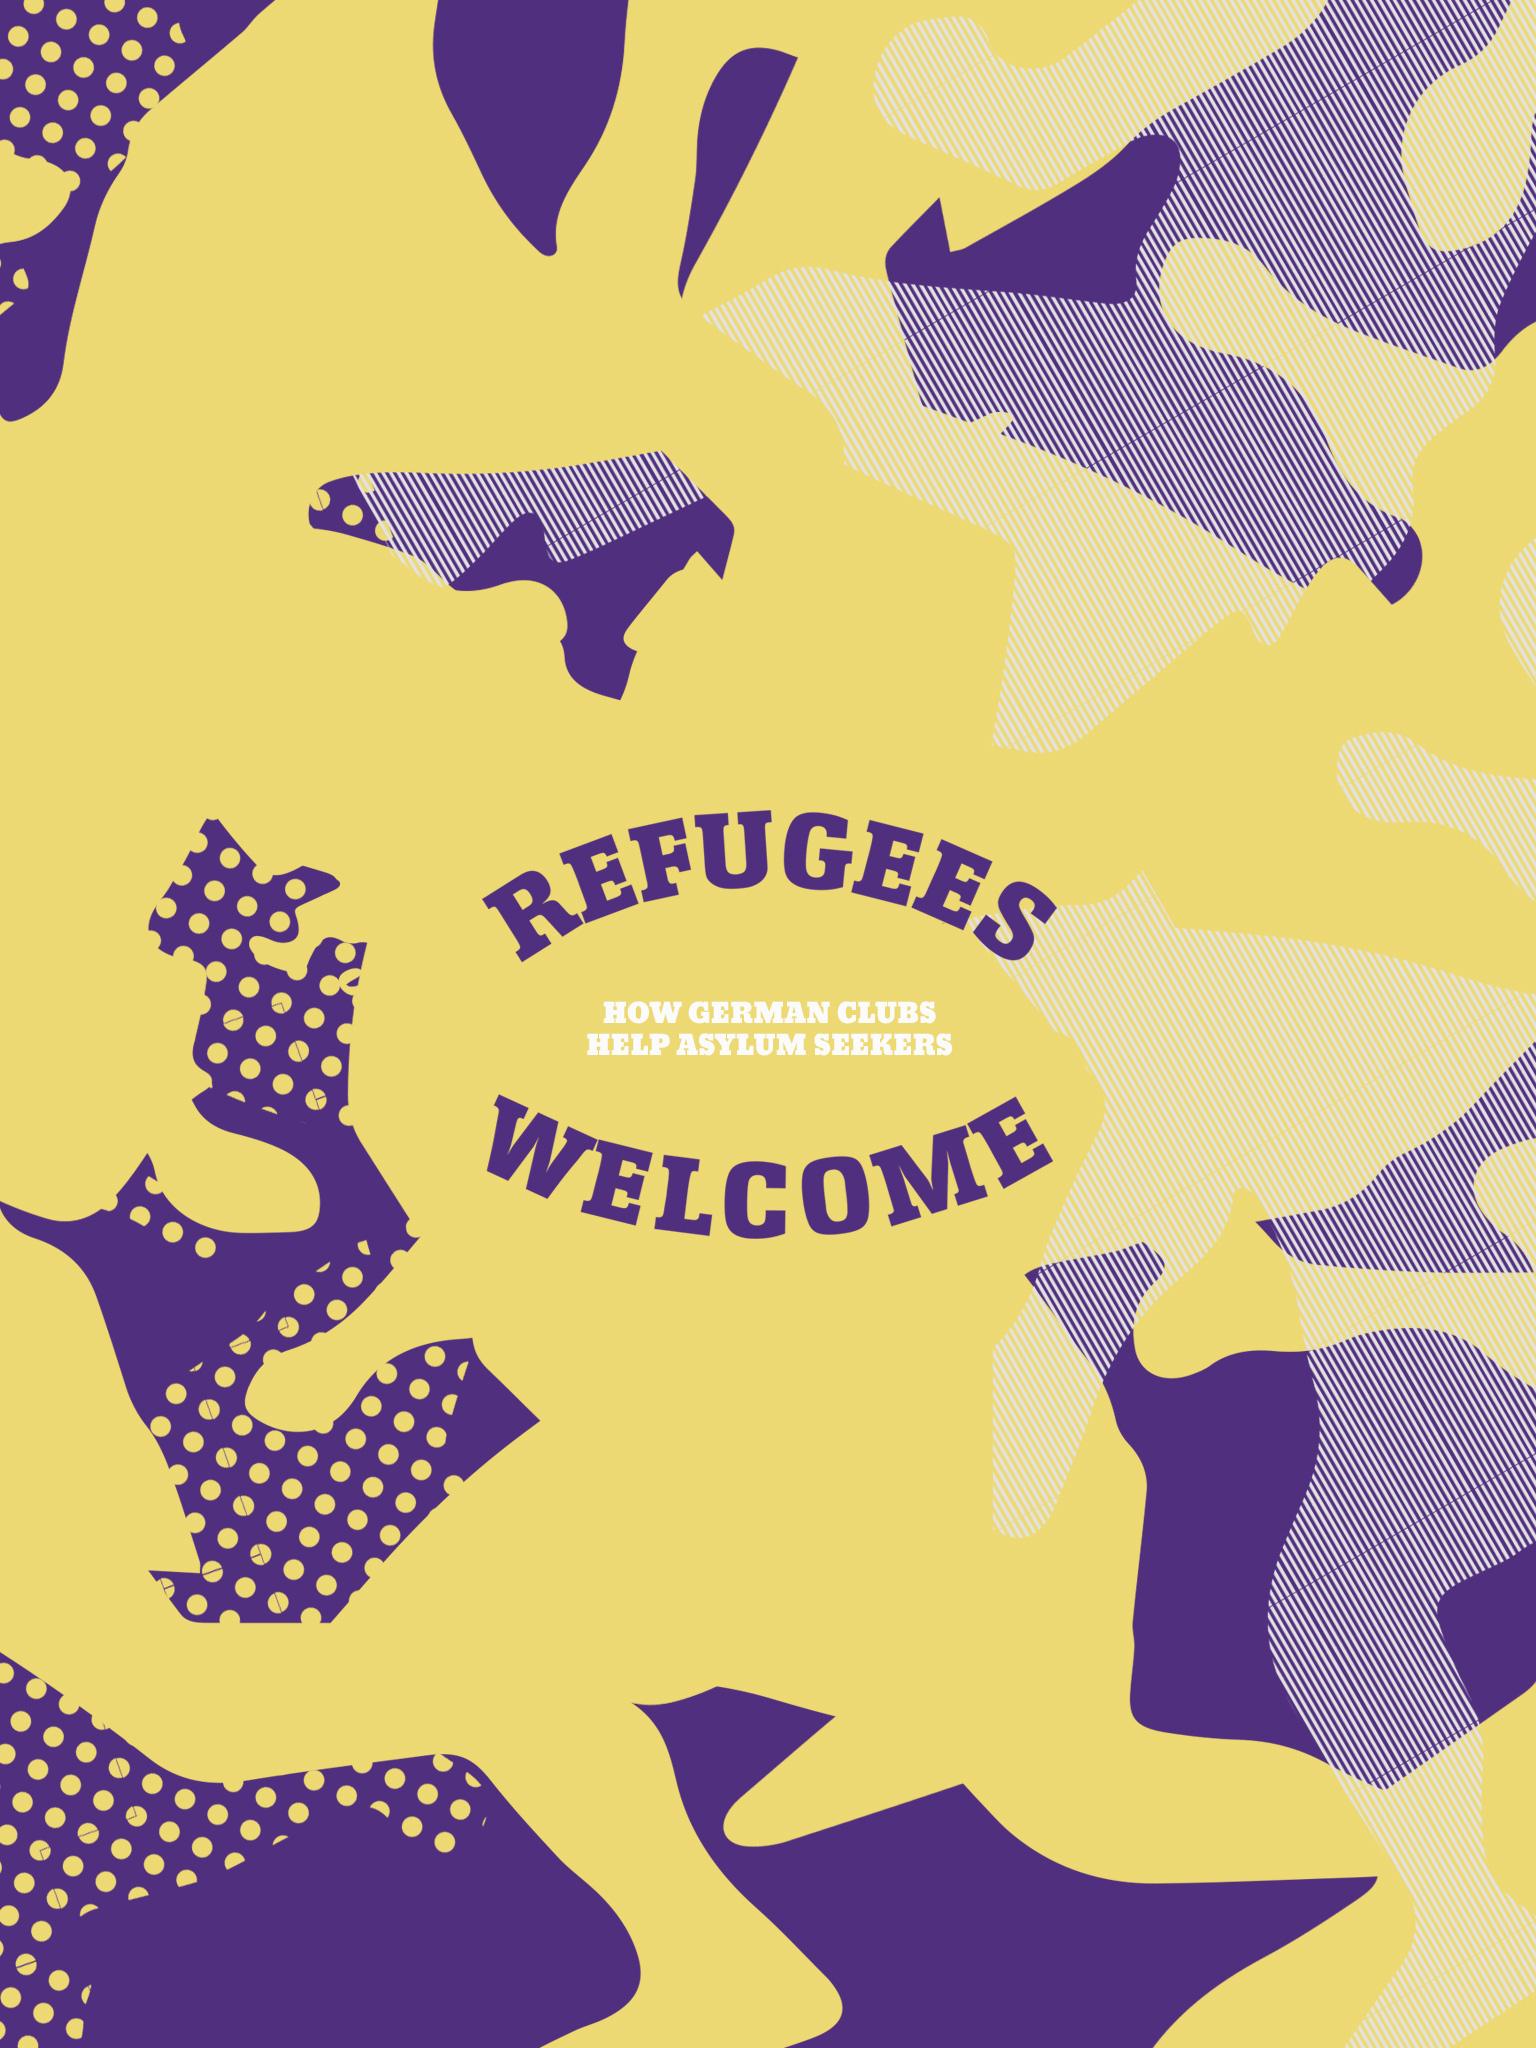 RA: Refugees welcome: How German clubs help asylum seekers